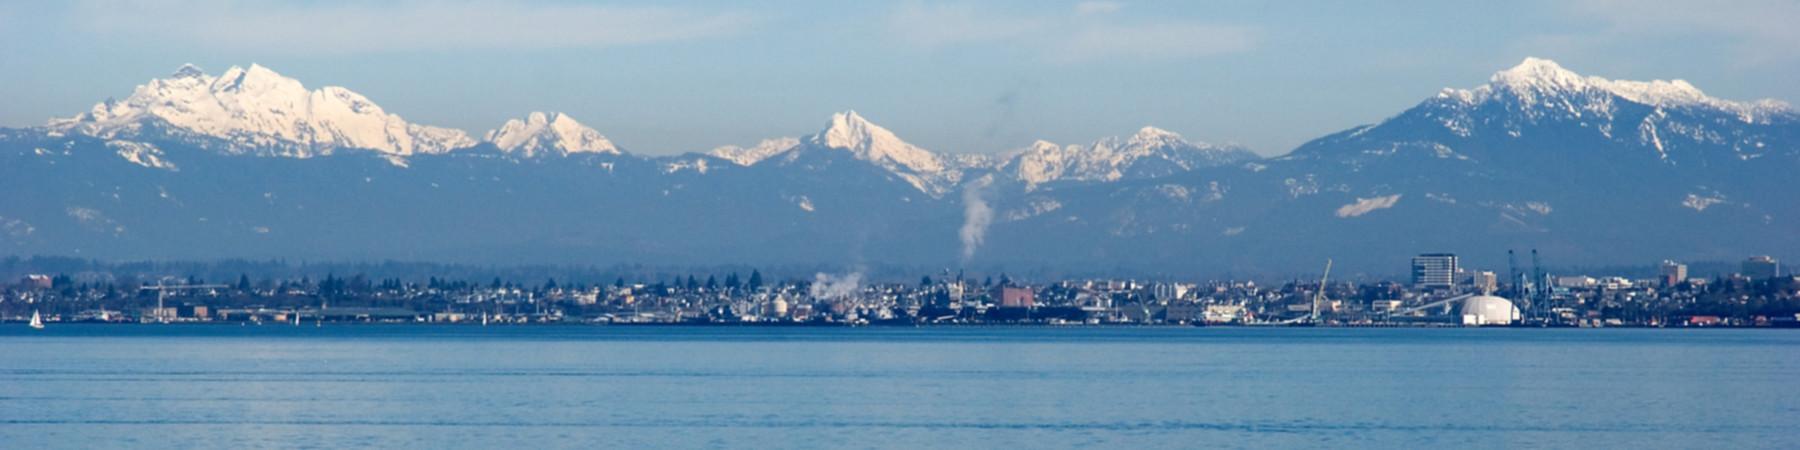 City Of Vancouver Washington